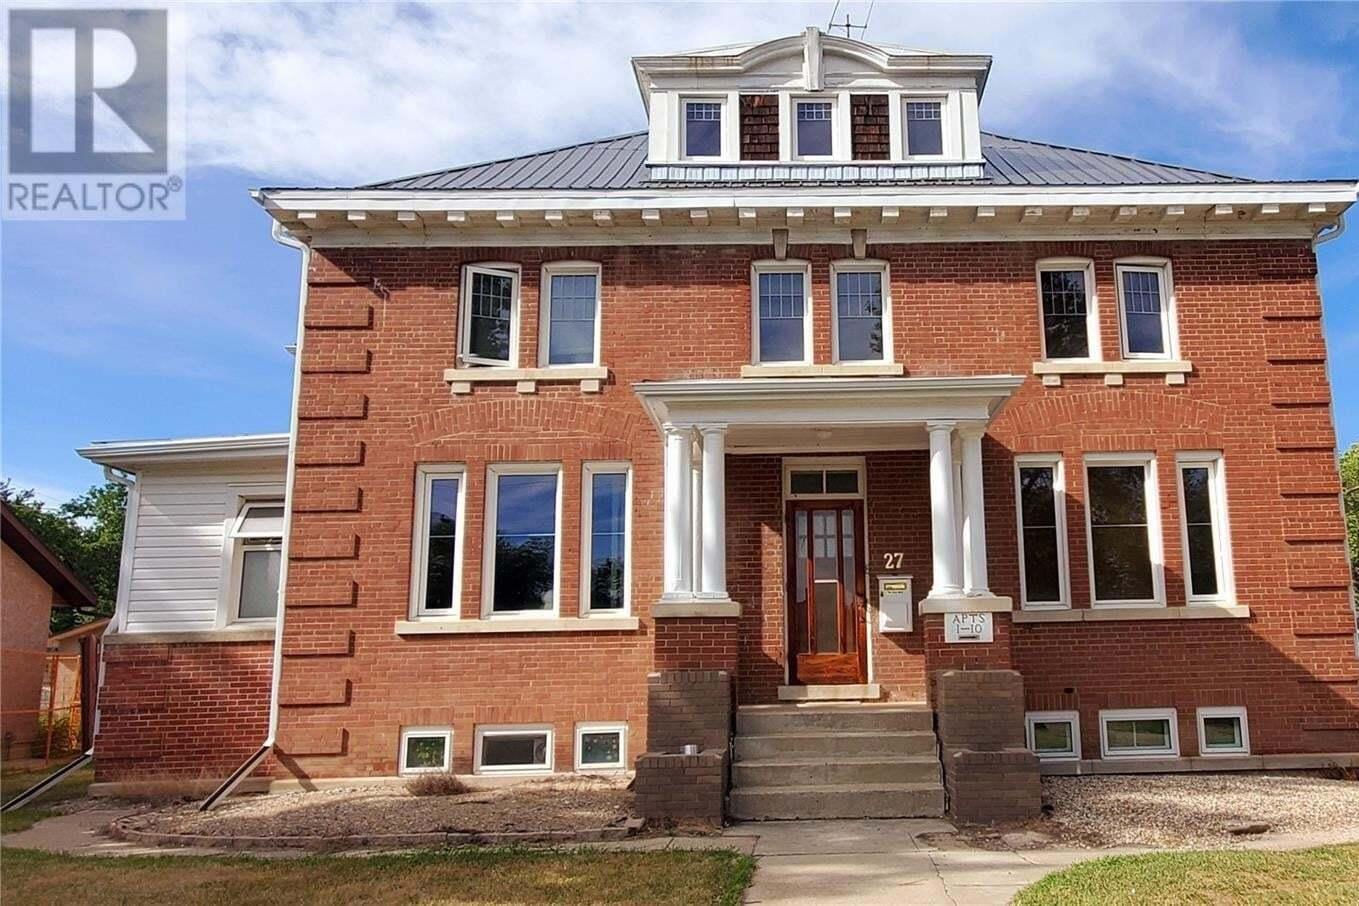 Townhouse for sale at 27 Dunlop St E Yorkton Saskatchewan - MLS: SK820919